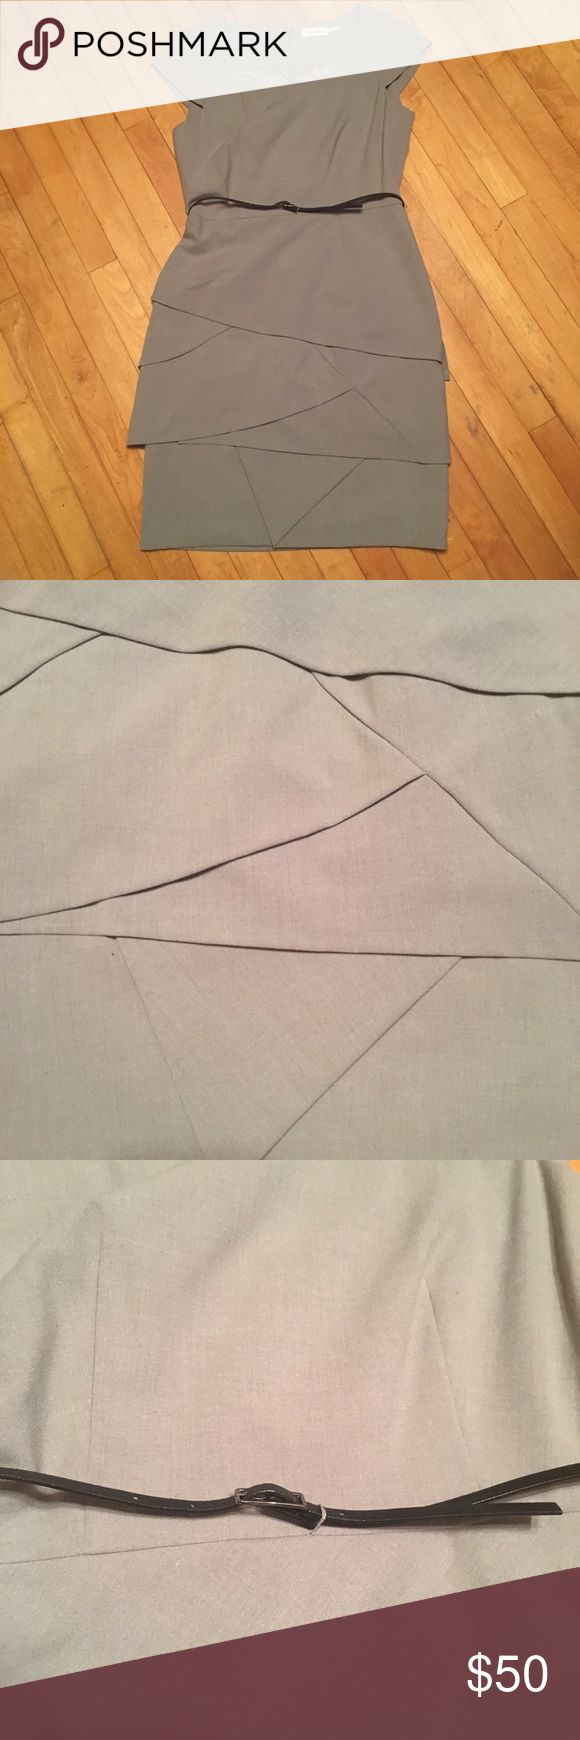 Beautiful artichoke skirt Calvin Klein dress Lovely grey dress with artichoke (asymmetrical tiered) hemline skirt and black skinny belt. Top is sleeveless. Size is 10. Little to no stretch. Calvin Klein Dresses Asymmetrical